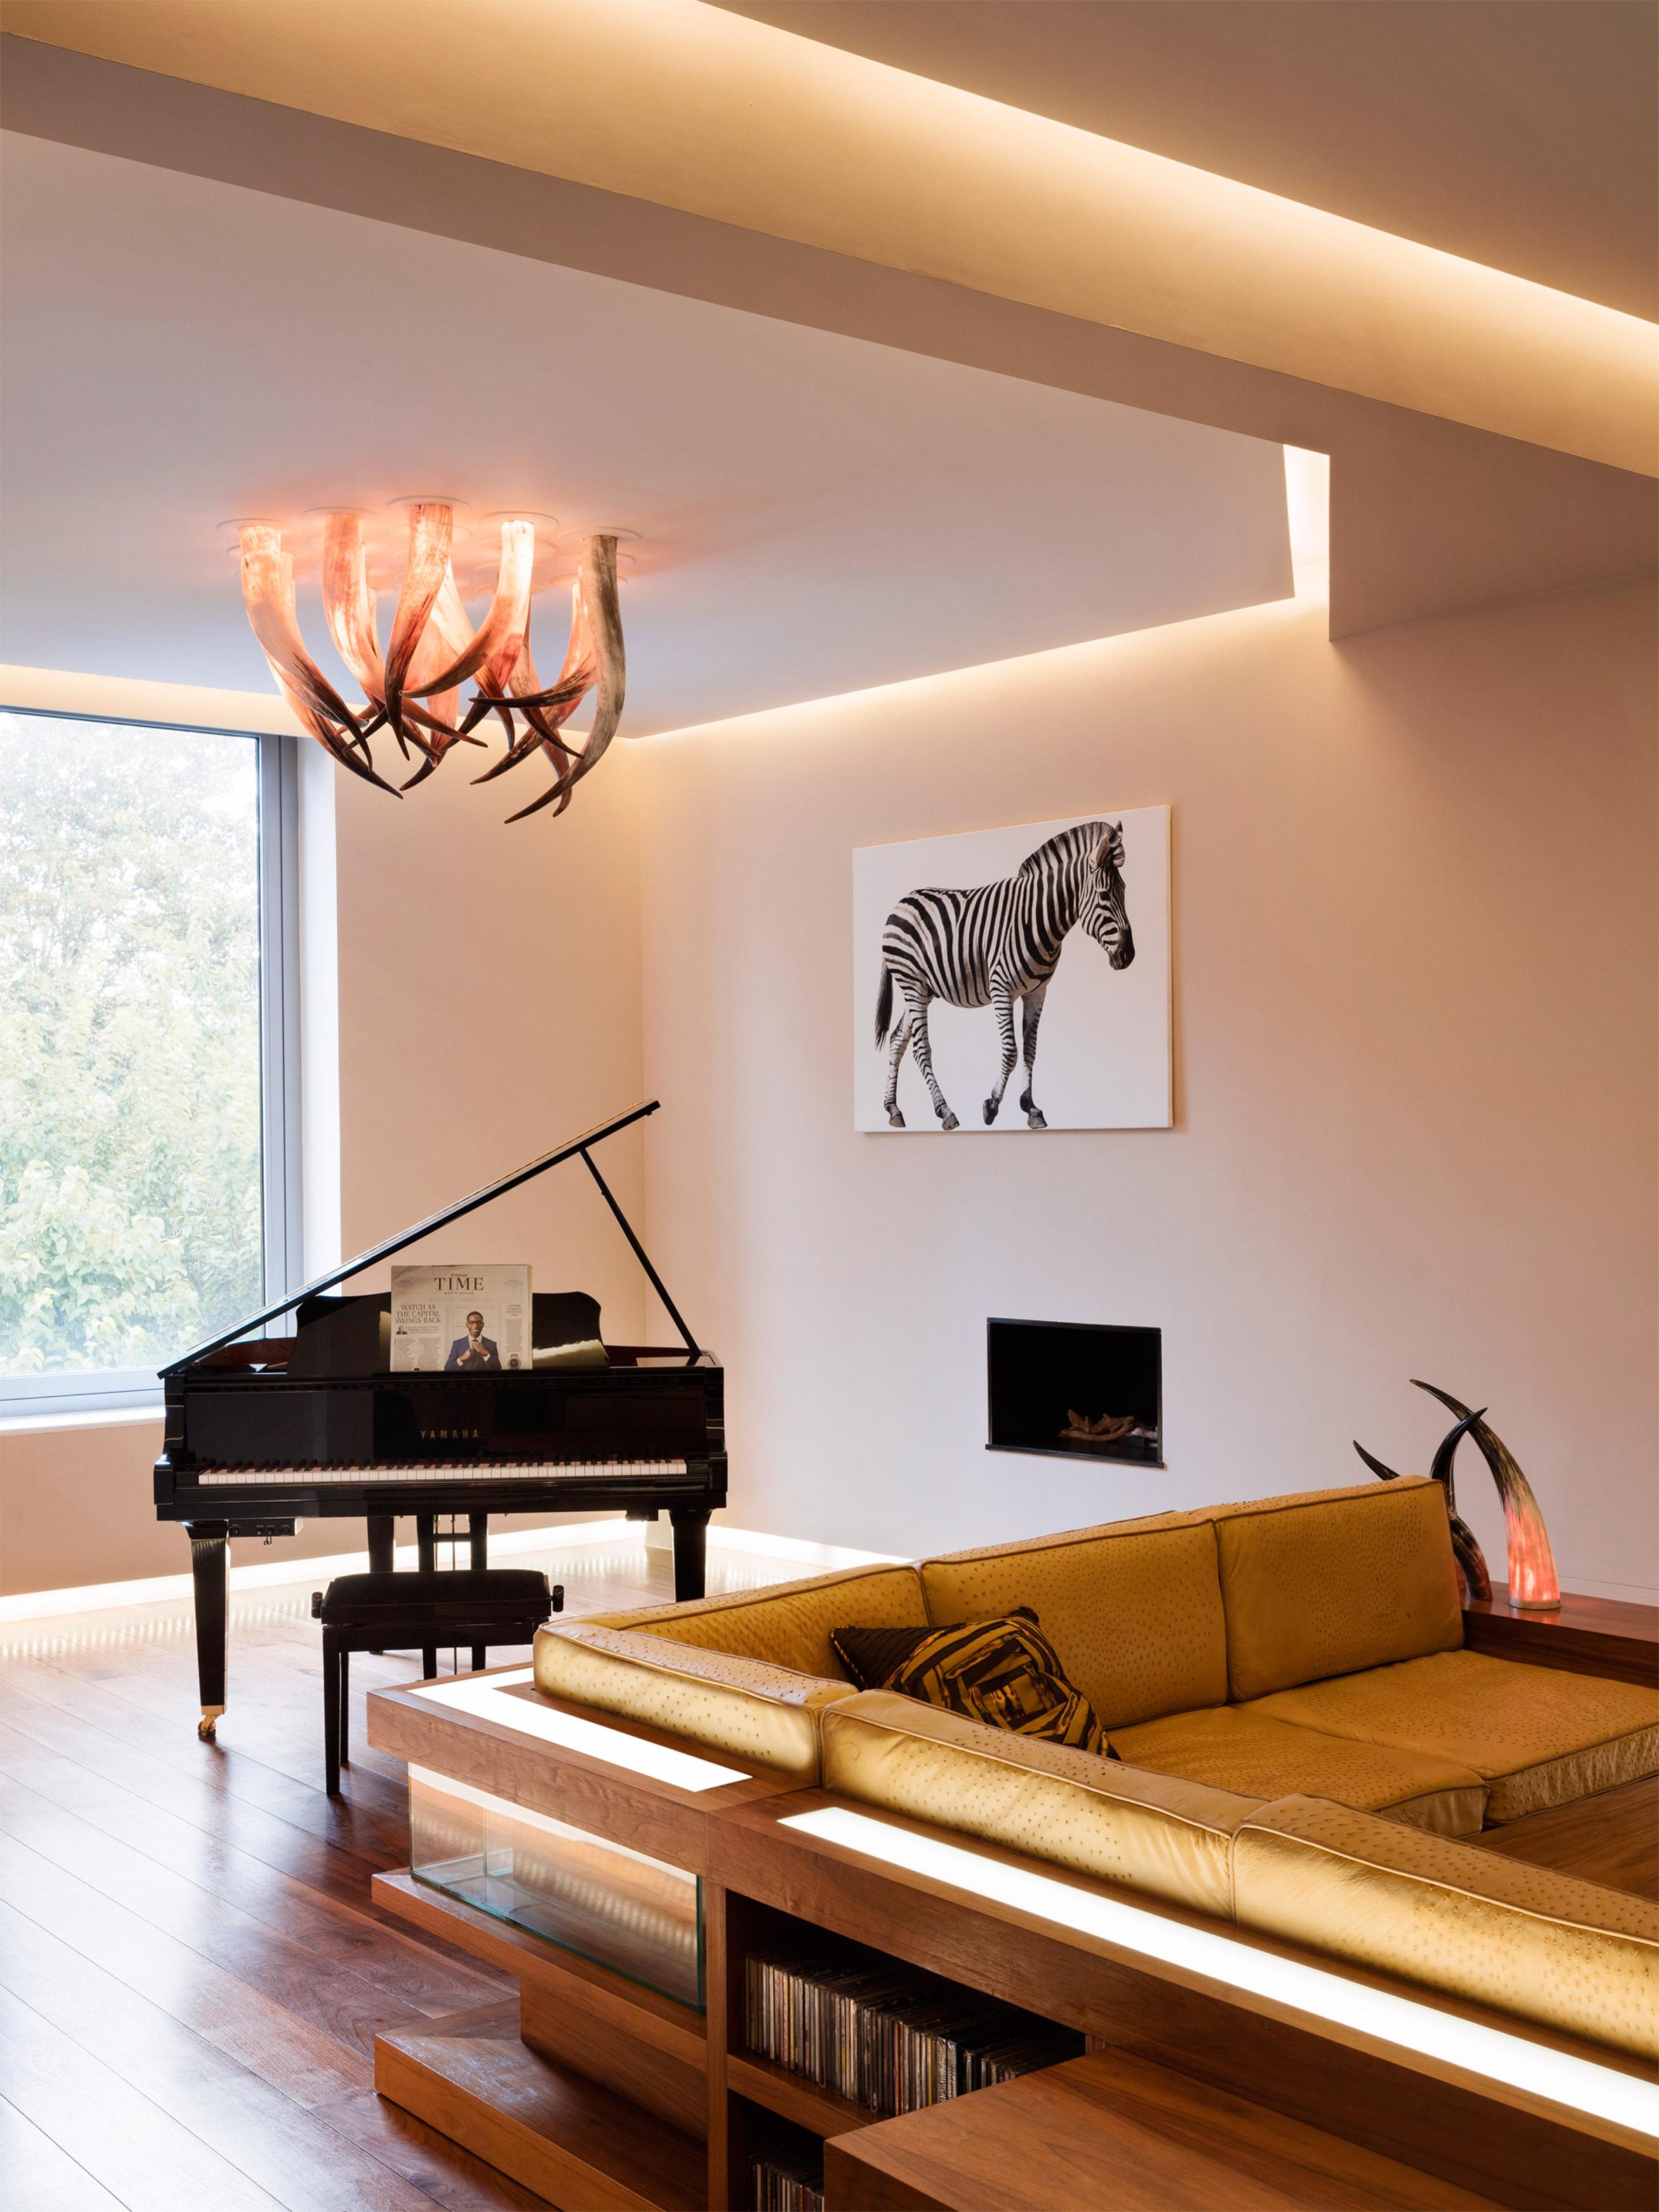 architecture-zebra-interior-design-studia-osnovadesign-osnova-poltava_06